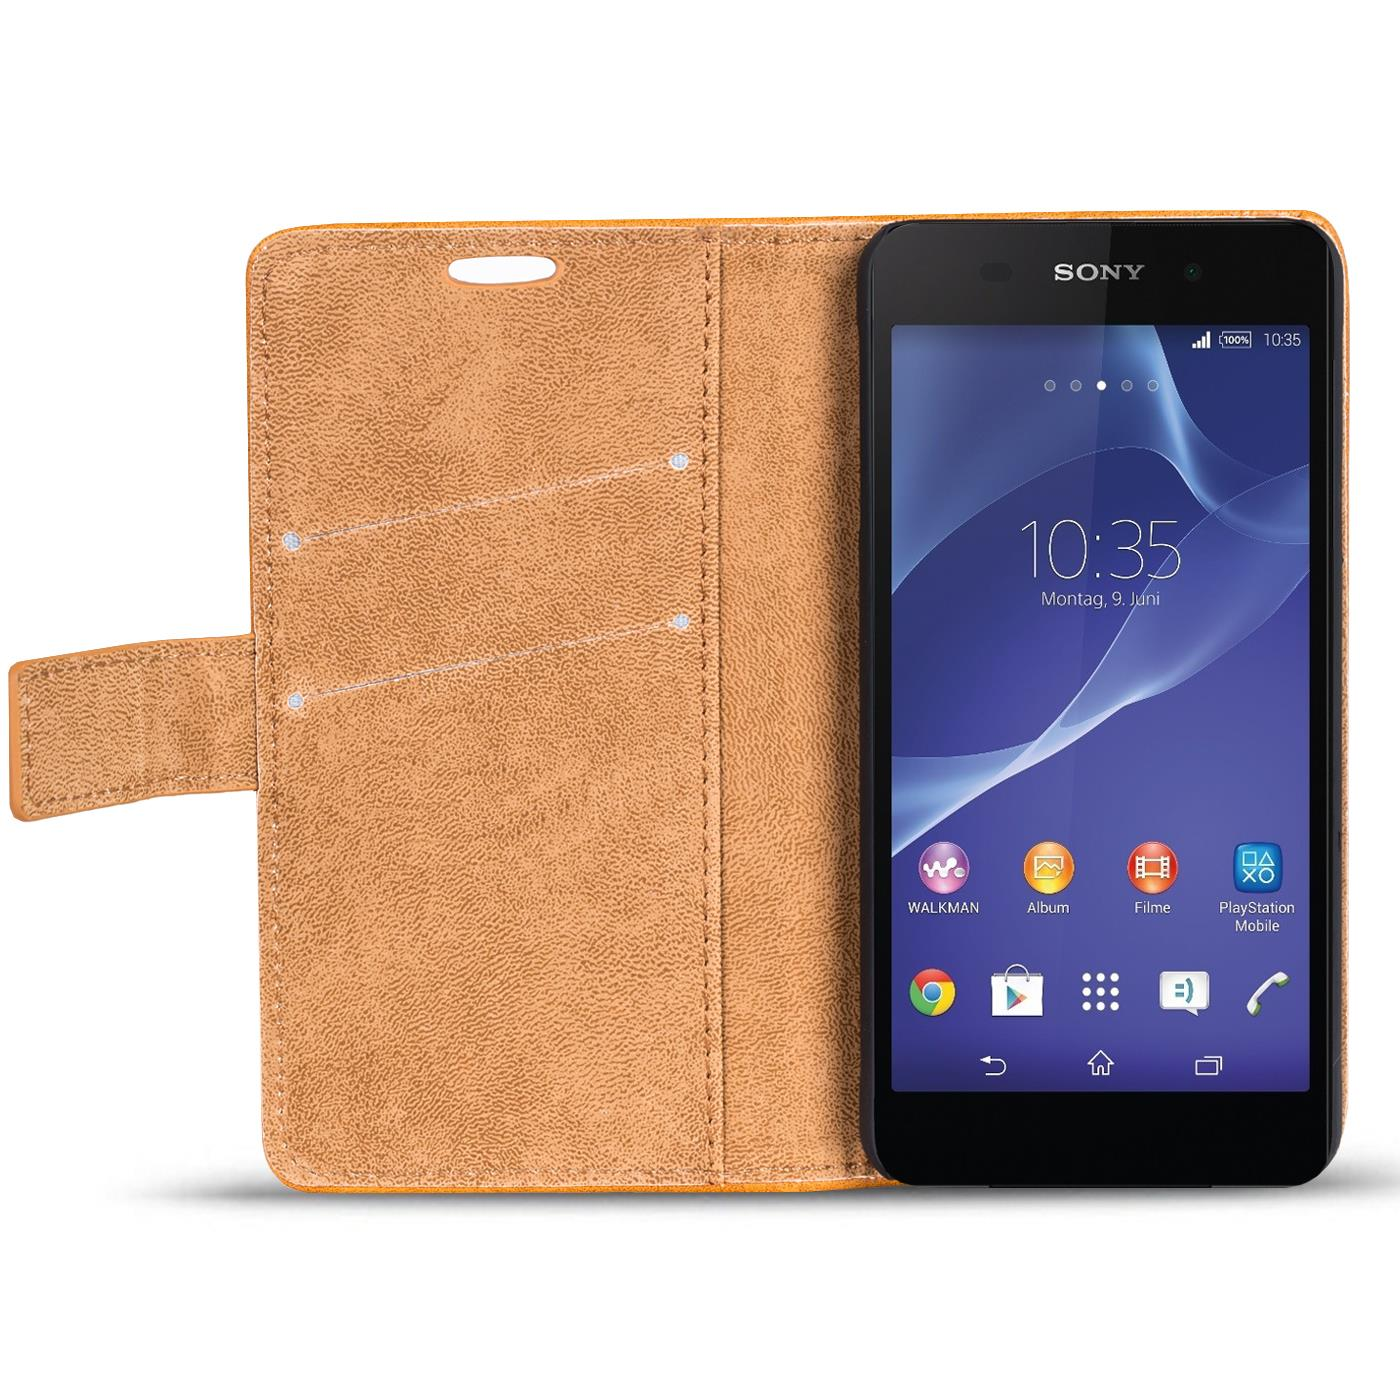 Handy Tasche Hülle Sony Xperia Z2 Case Klapphülle PU Leder ...